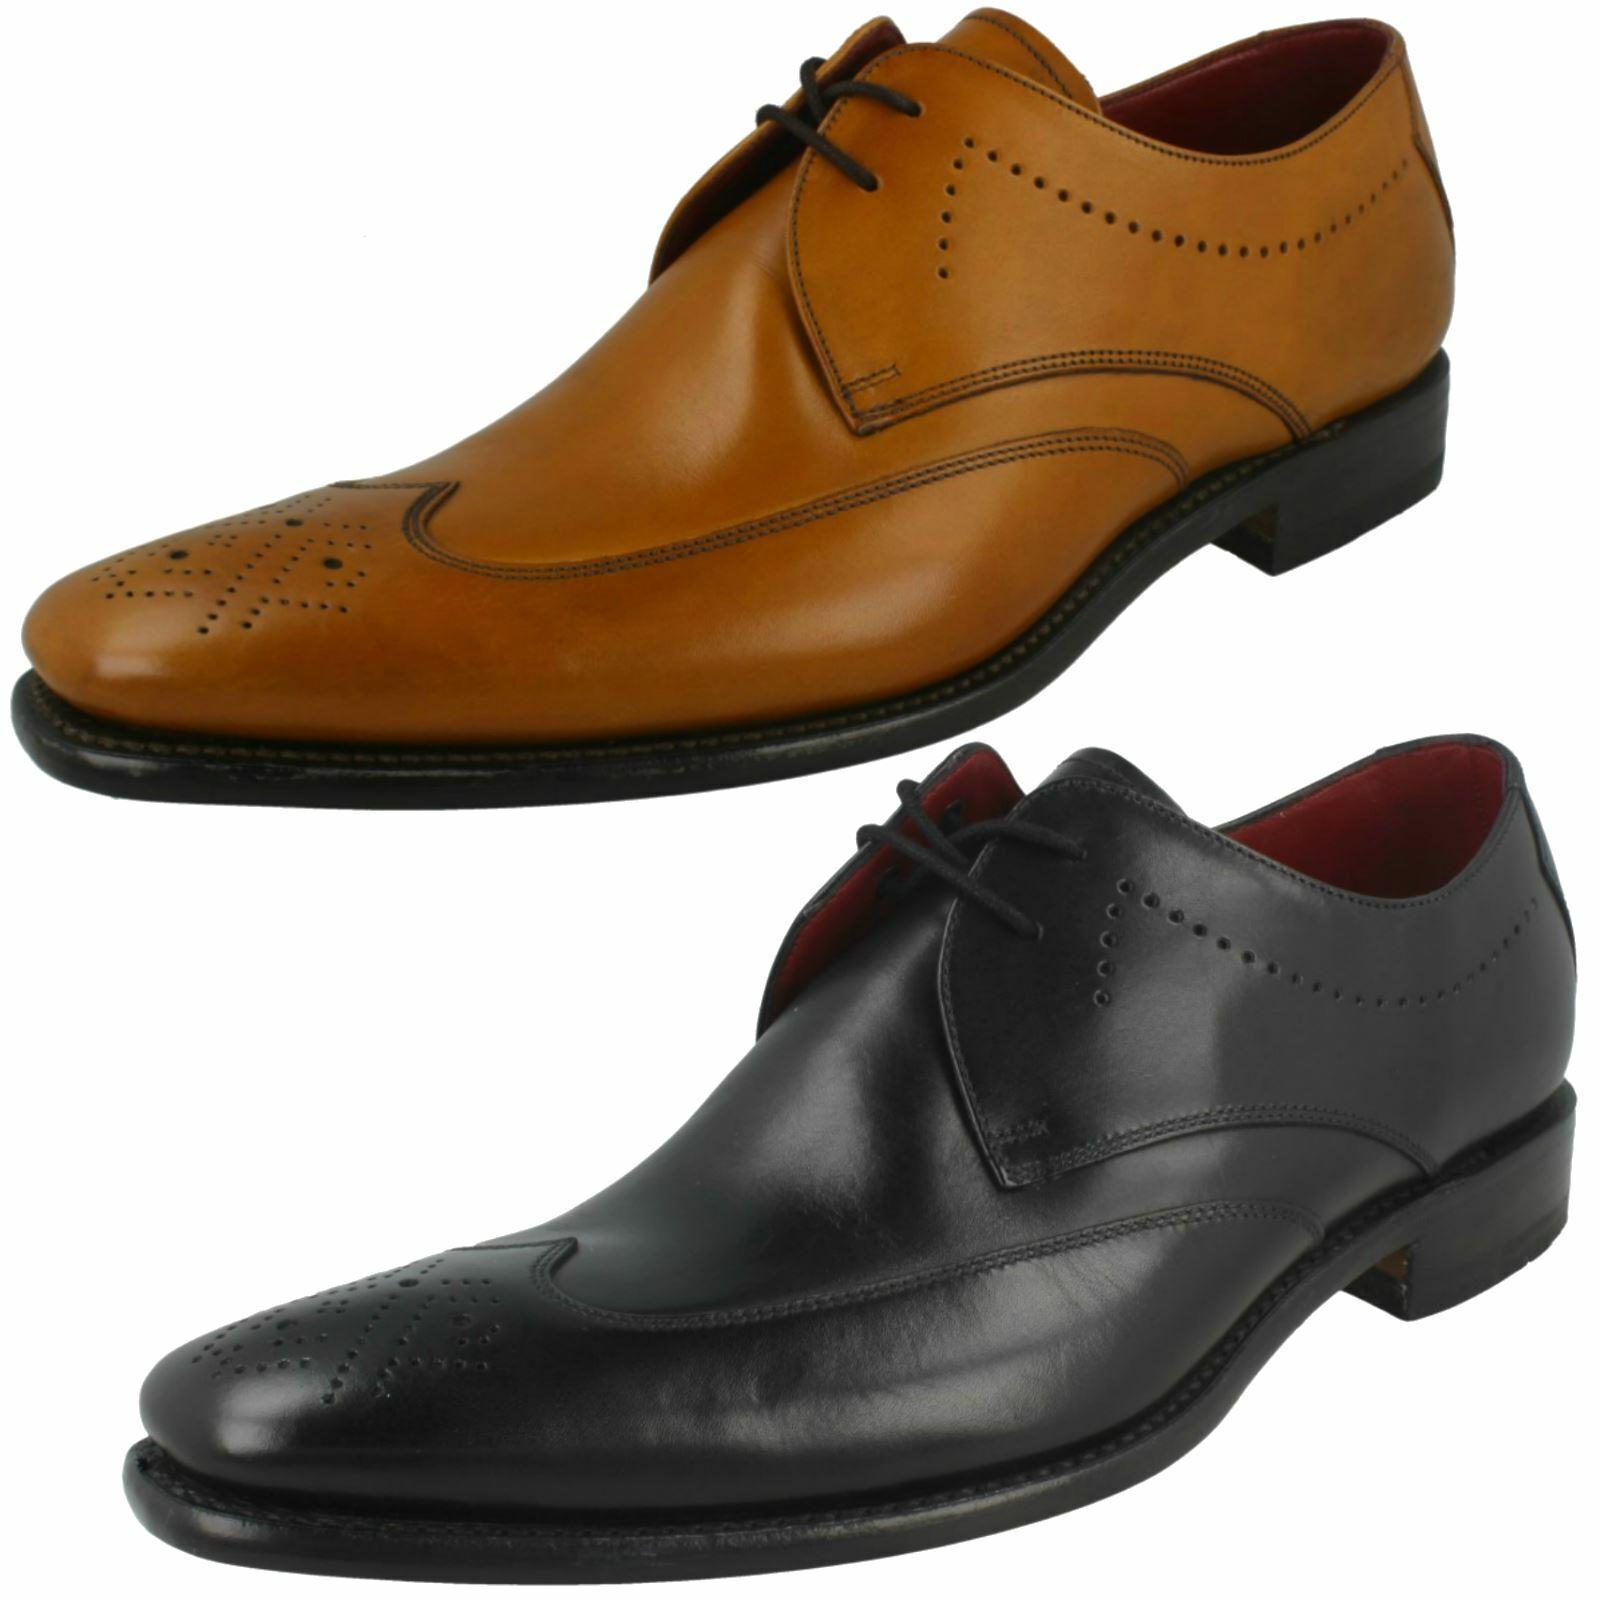 negozio online Da Uomo Loake CALATA stringati in in in pelle scarpe-stitch  qualità ufficiale